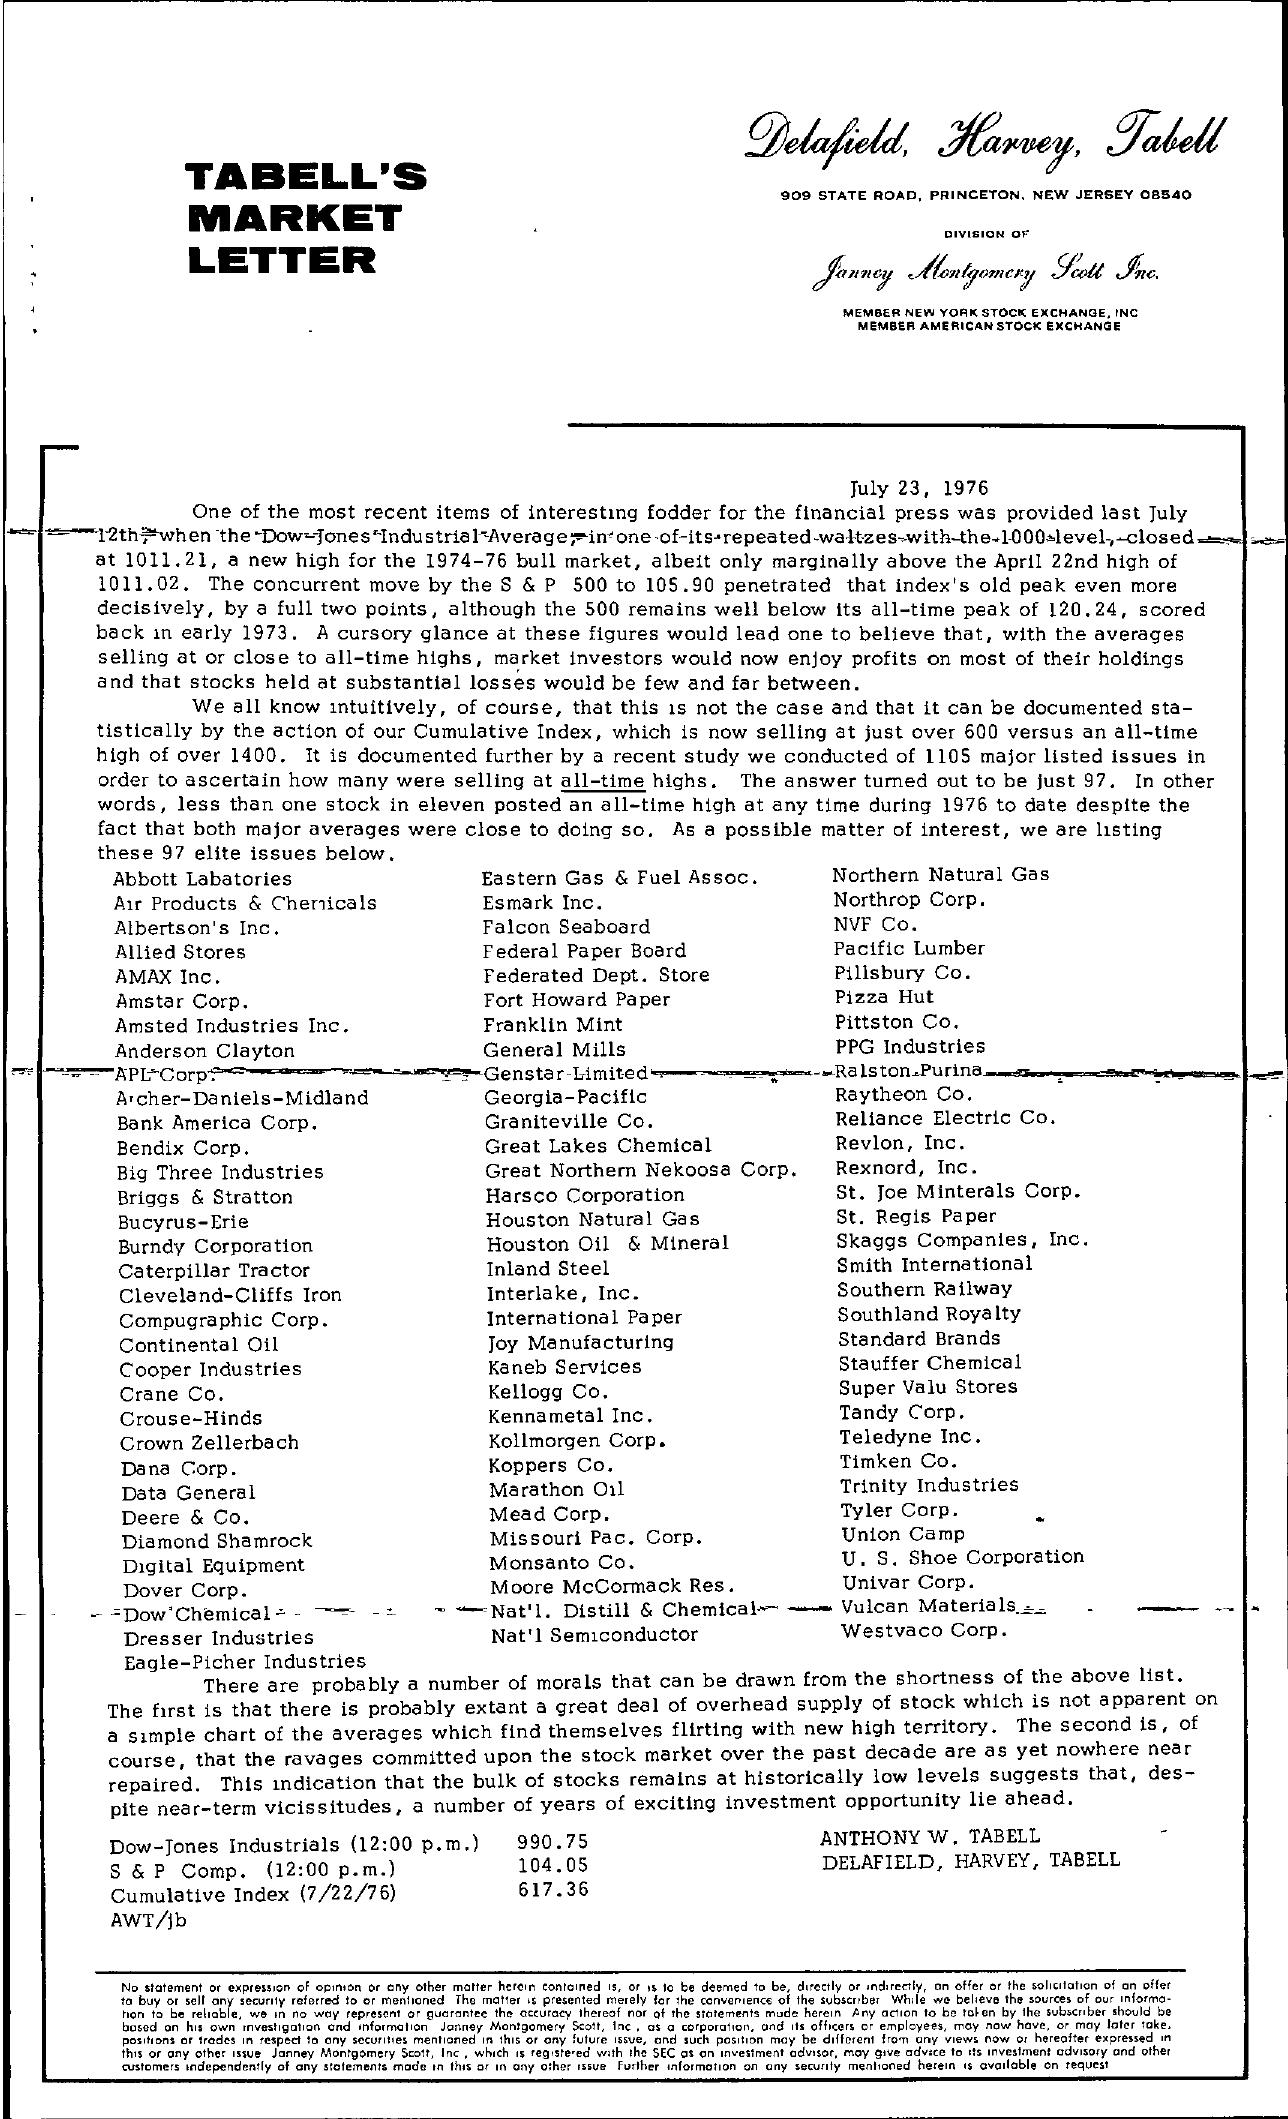 Tabell's Market Letter - July 23, 1976